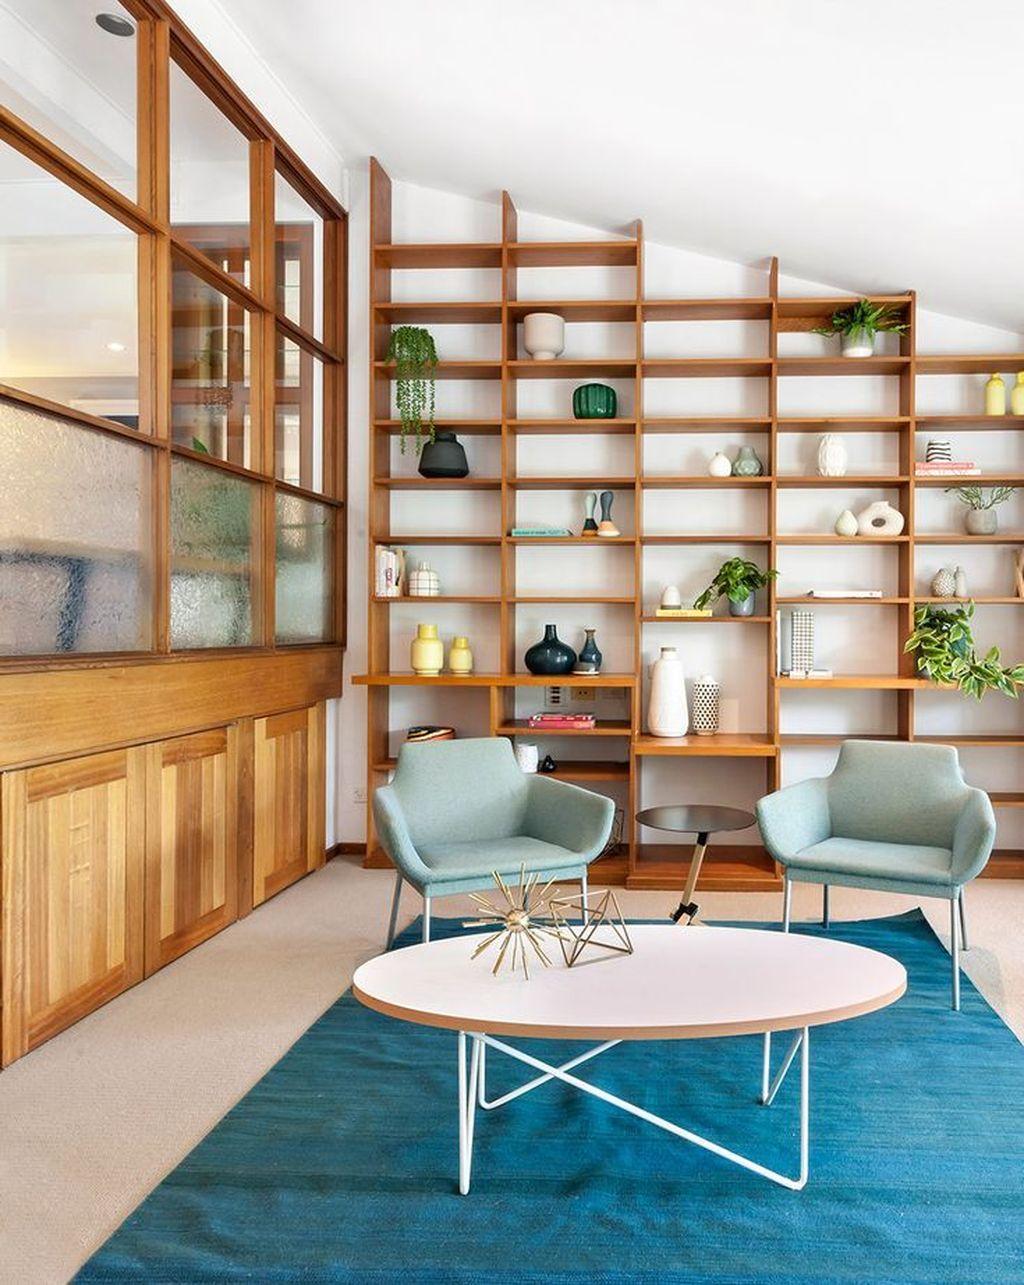 Admirable Mid Century Modern House Design Ideas 16